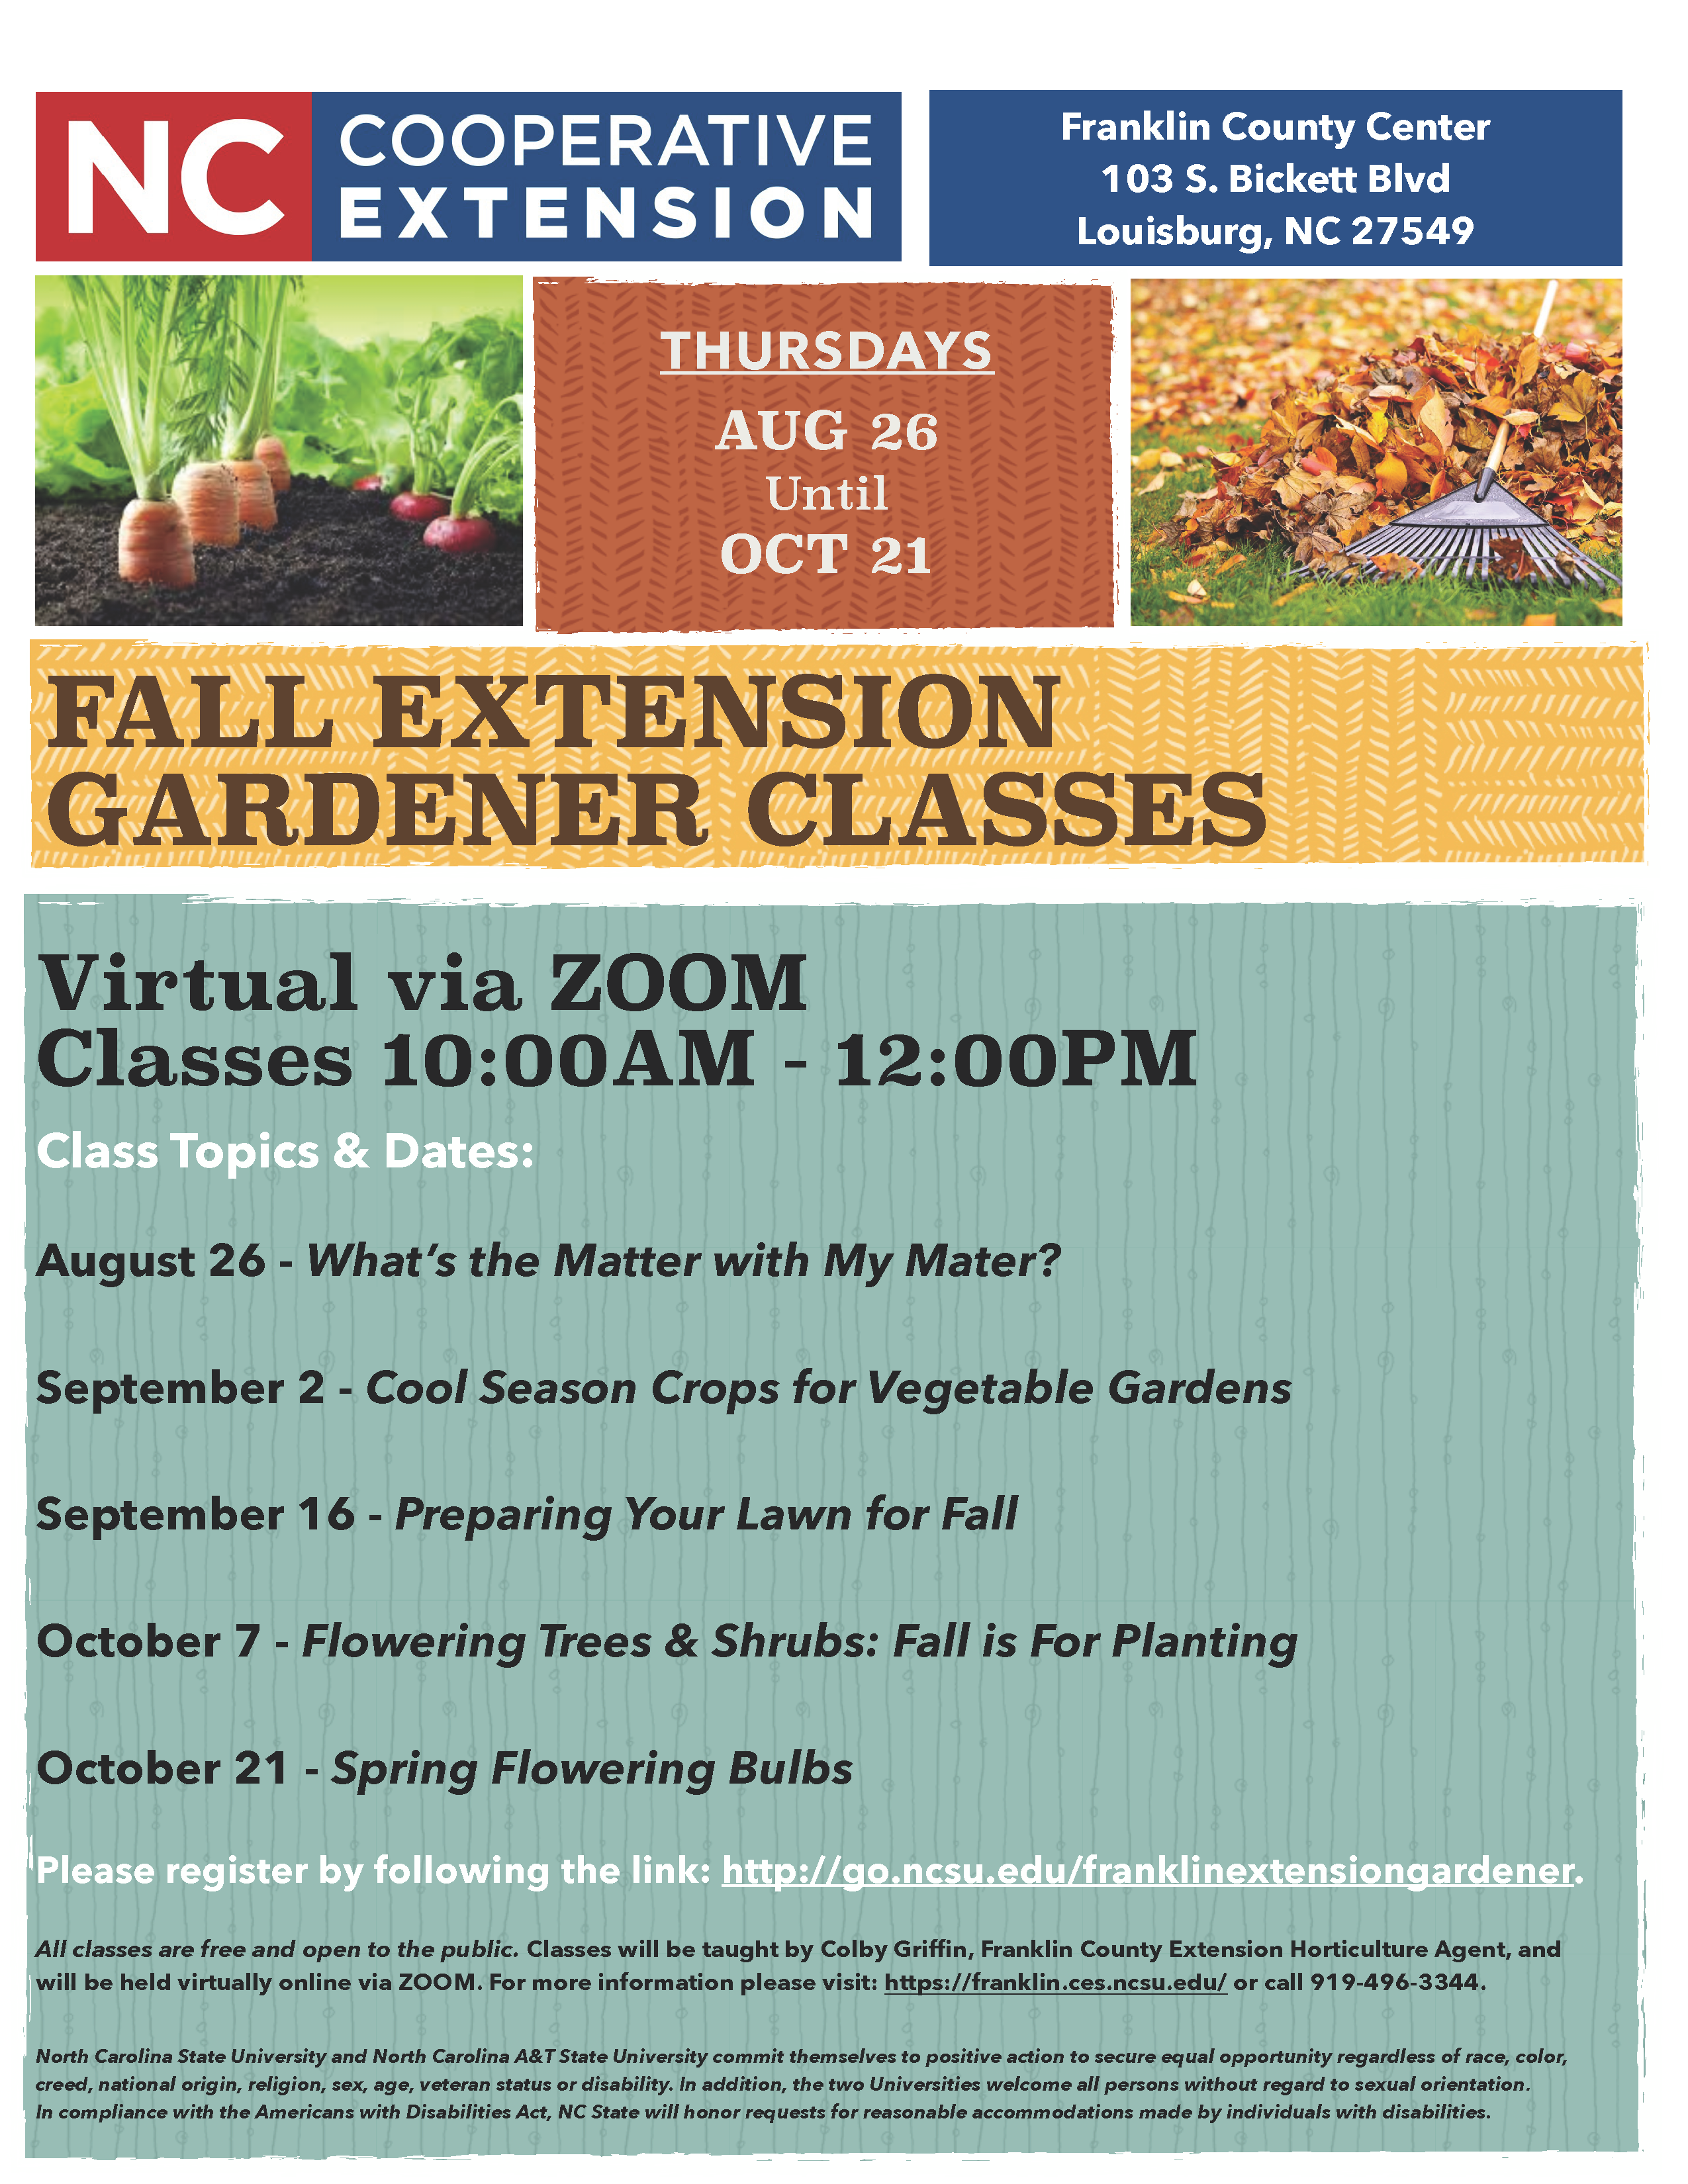 Fall Extension Gardener Classes flyer